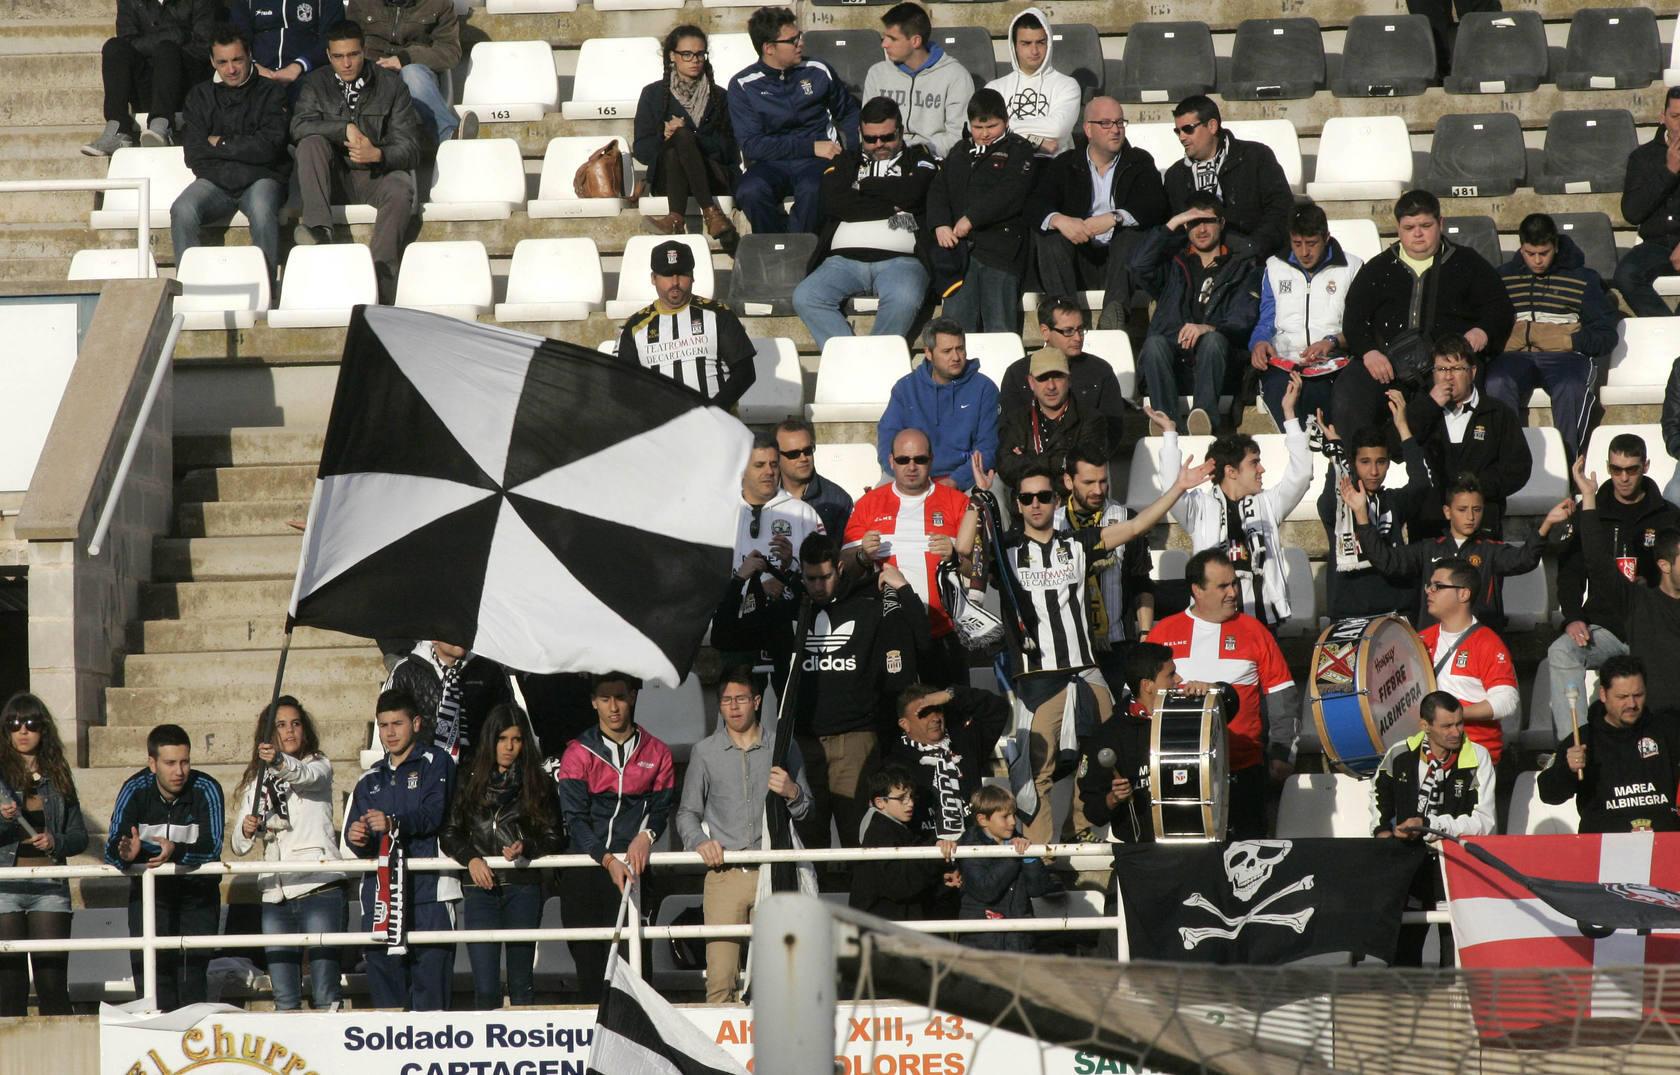 FC Cartagena - Cádiz (2-0)